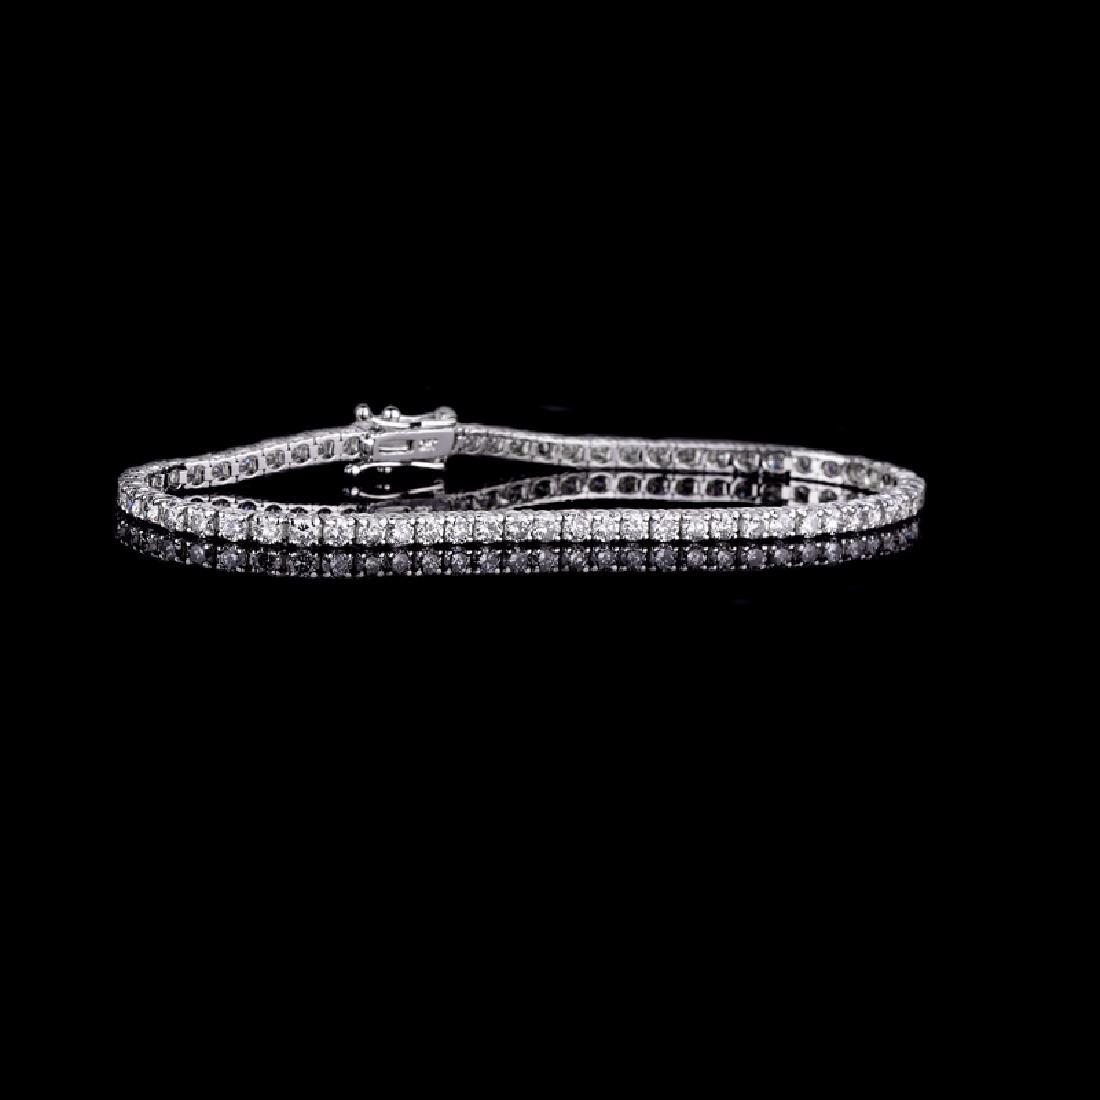 *Fine Jewelry 18 kt. White Gold, Custom Made 2.02CT